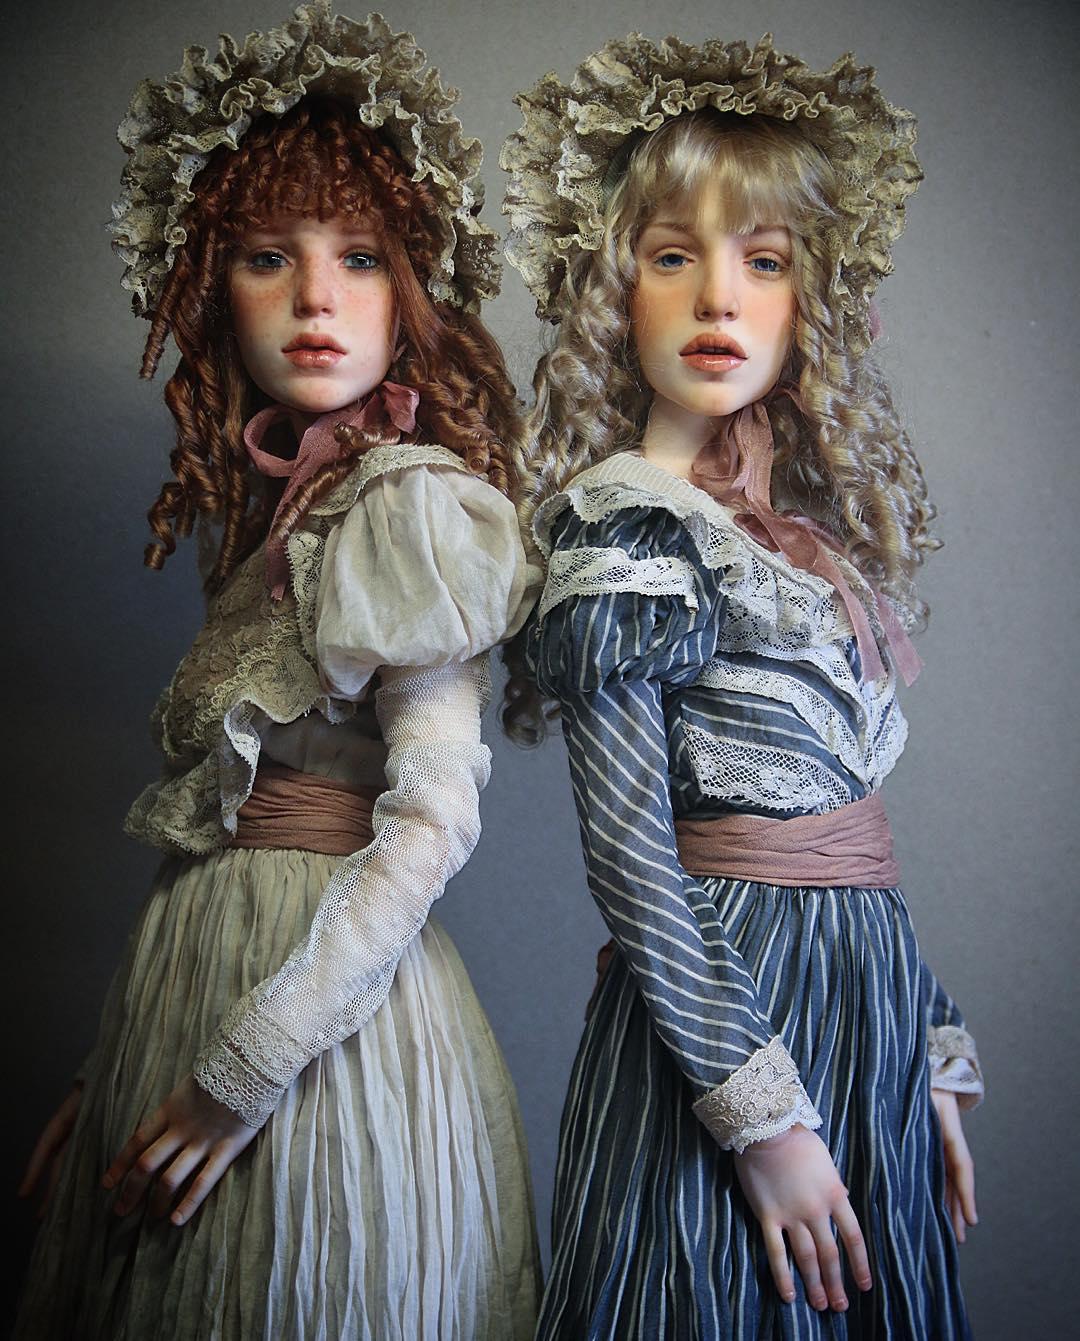 куклы своими руками, изготовление кукол своими руками, куклы сделанные руками фото-7